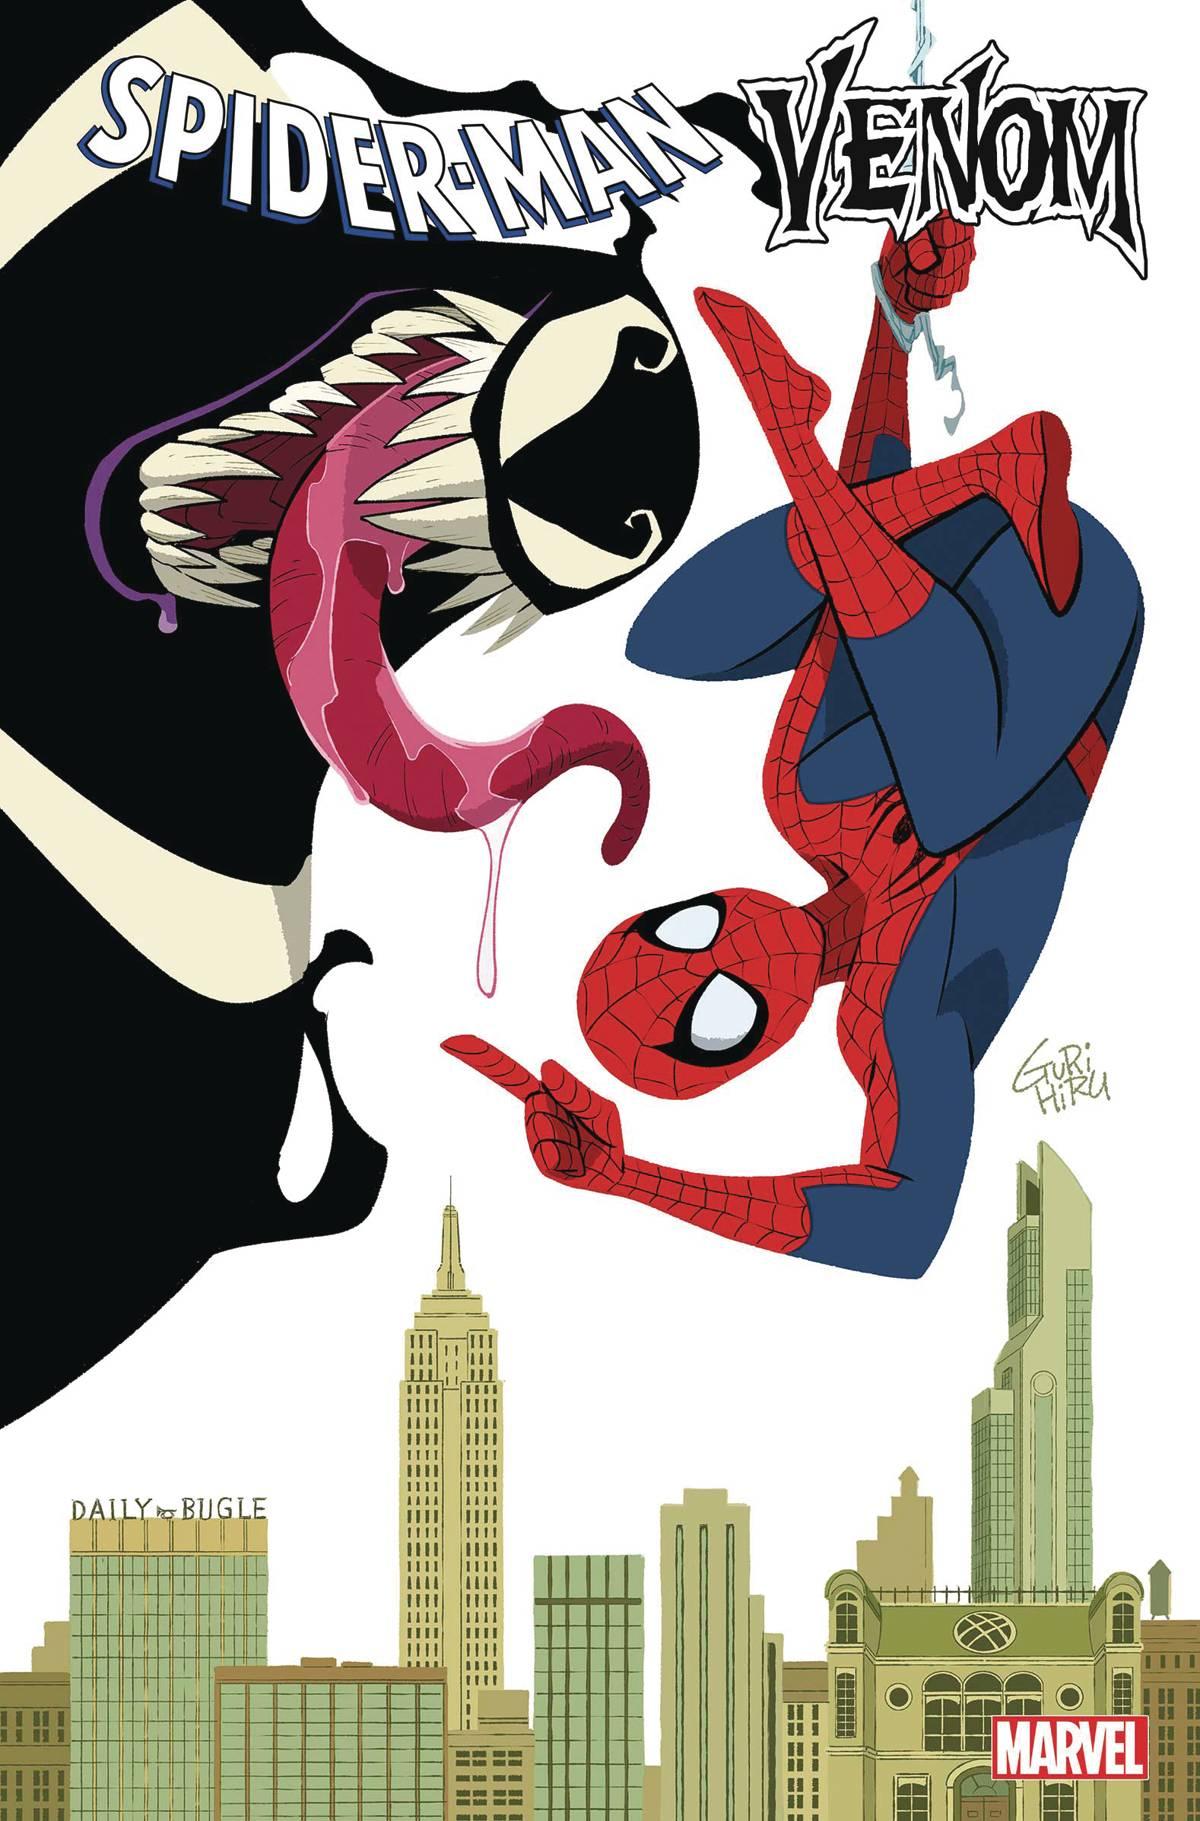 SPIDER-MAN & VENOM DOUBLE TROUBLE #1 (OF 4)